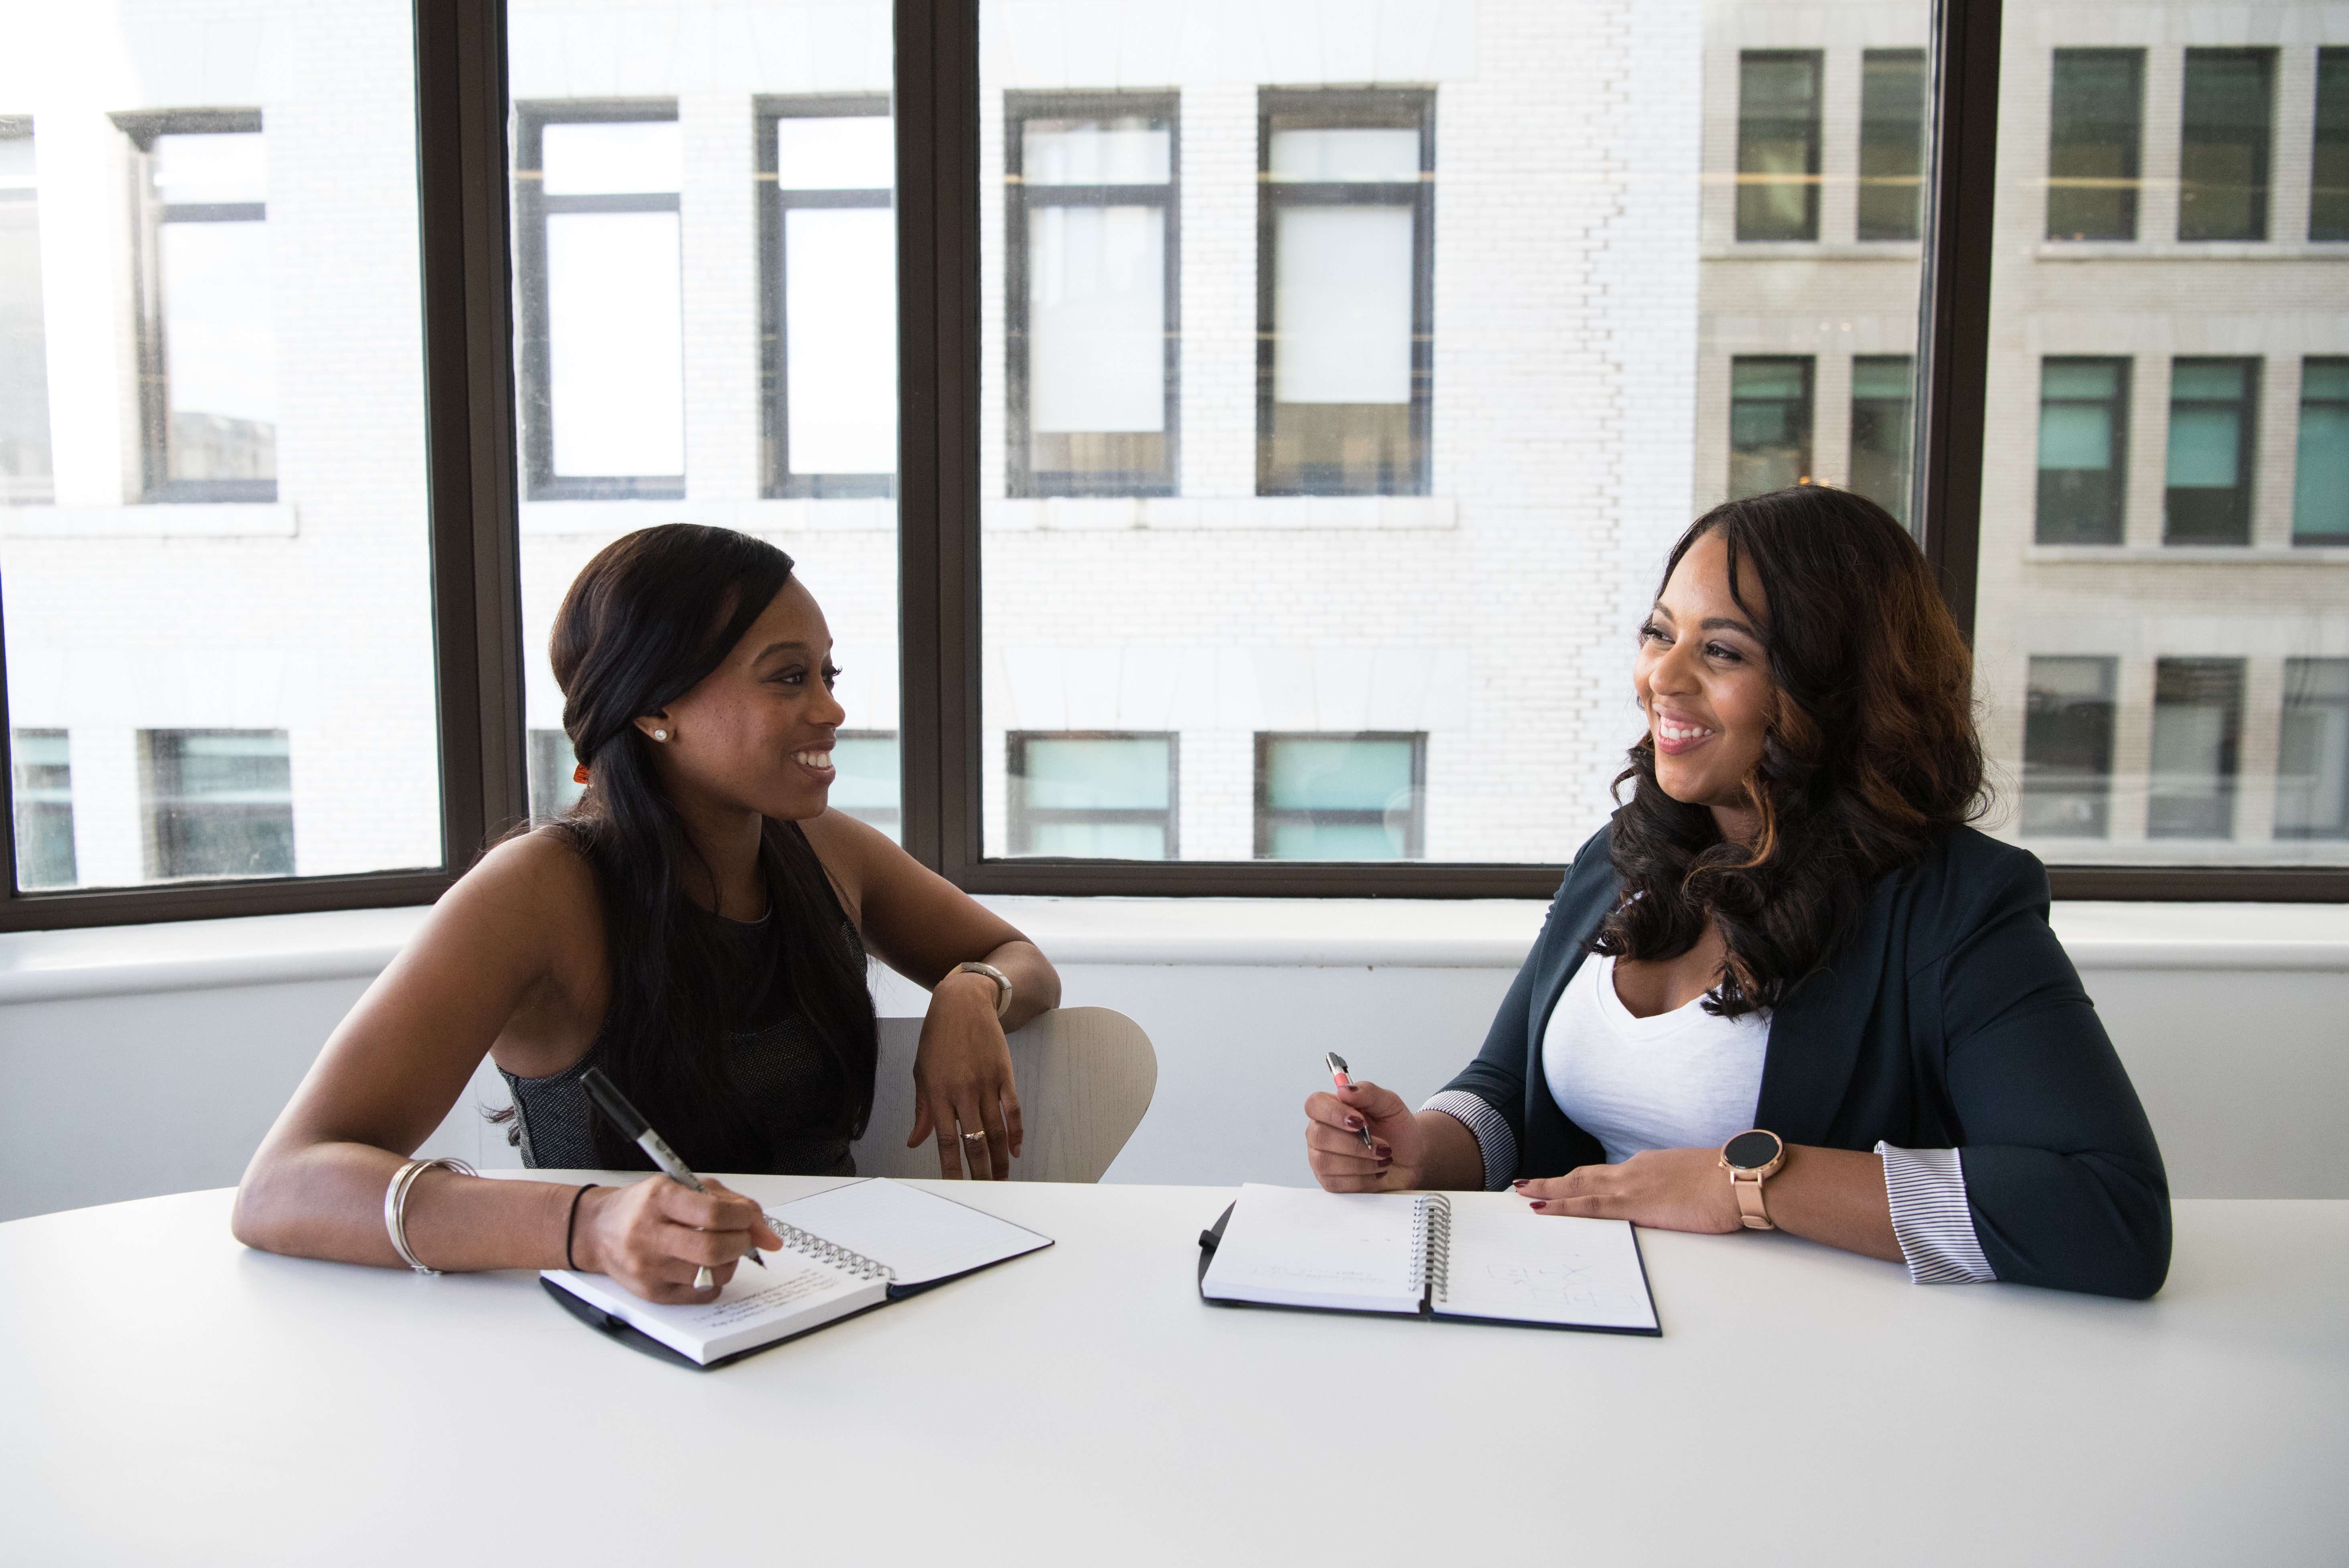 two women meeting working